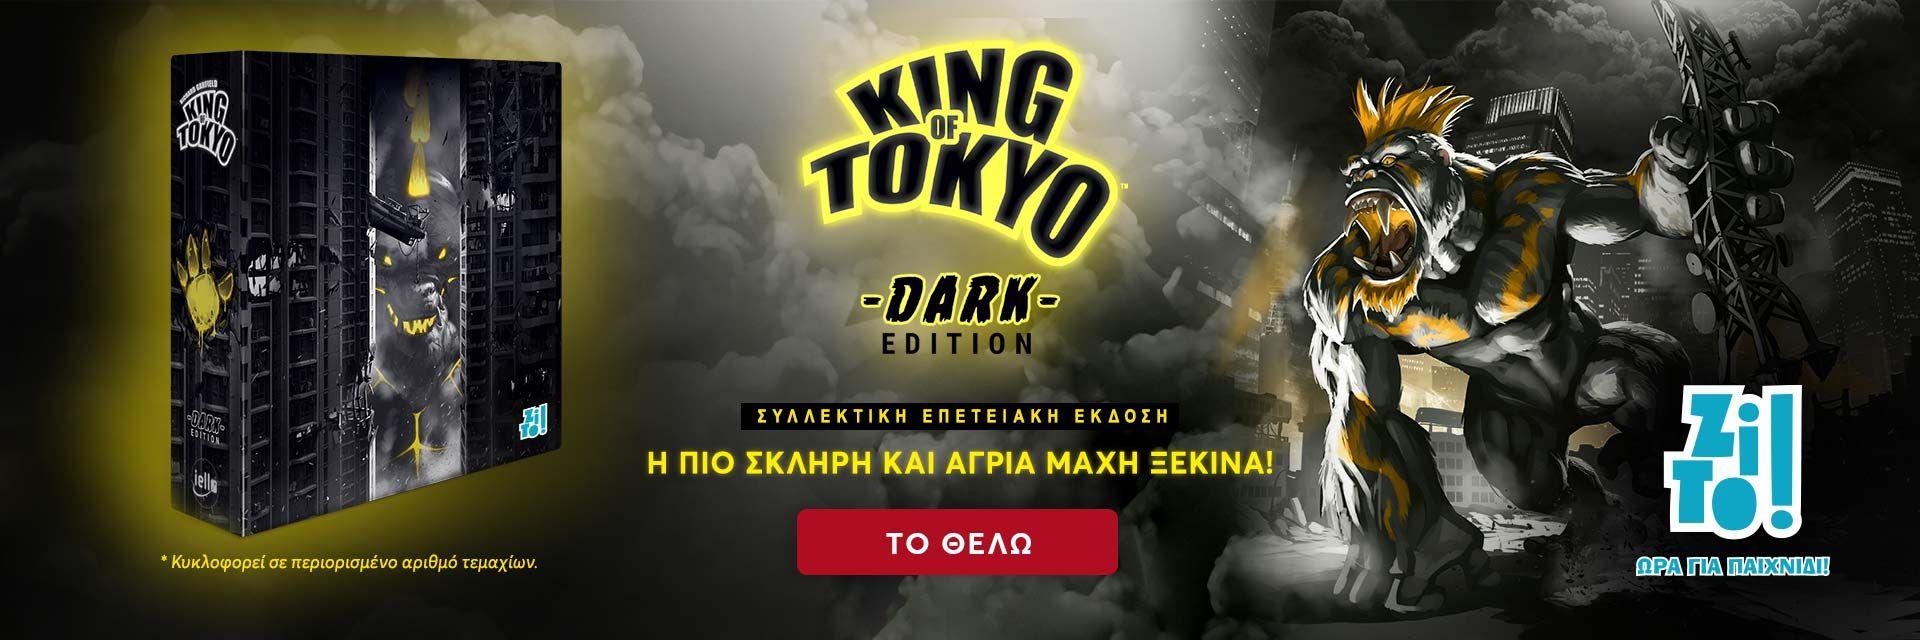 ZITO!-KING OF TOKYO DARK EDITION (ΣΥΛΛΕΚΤΙΚΗ ΕΚΔΟΣΗ)